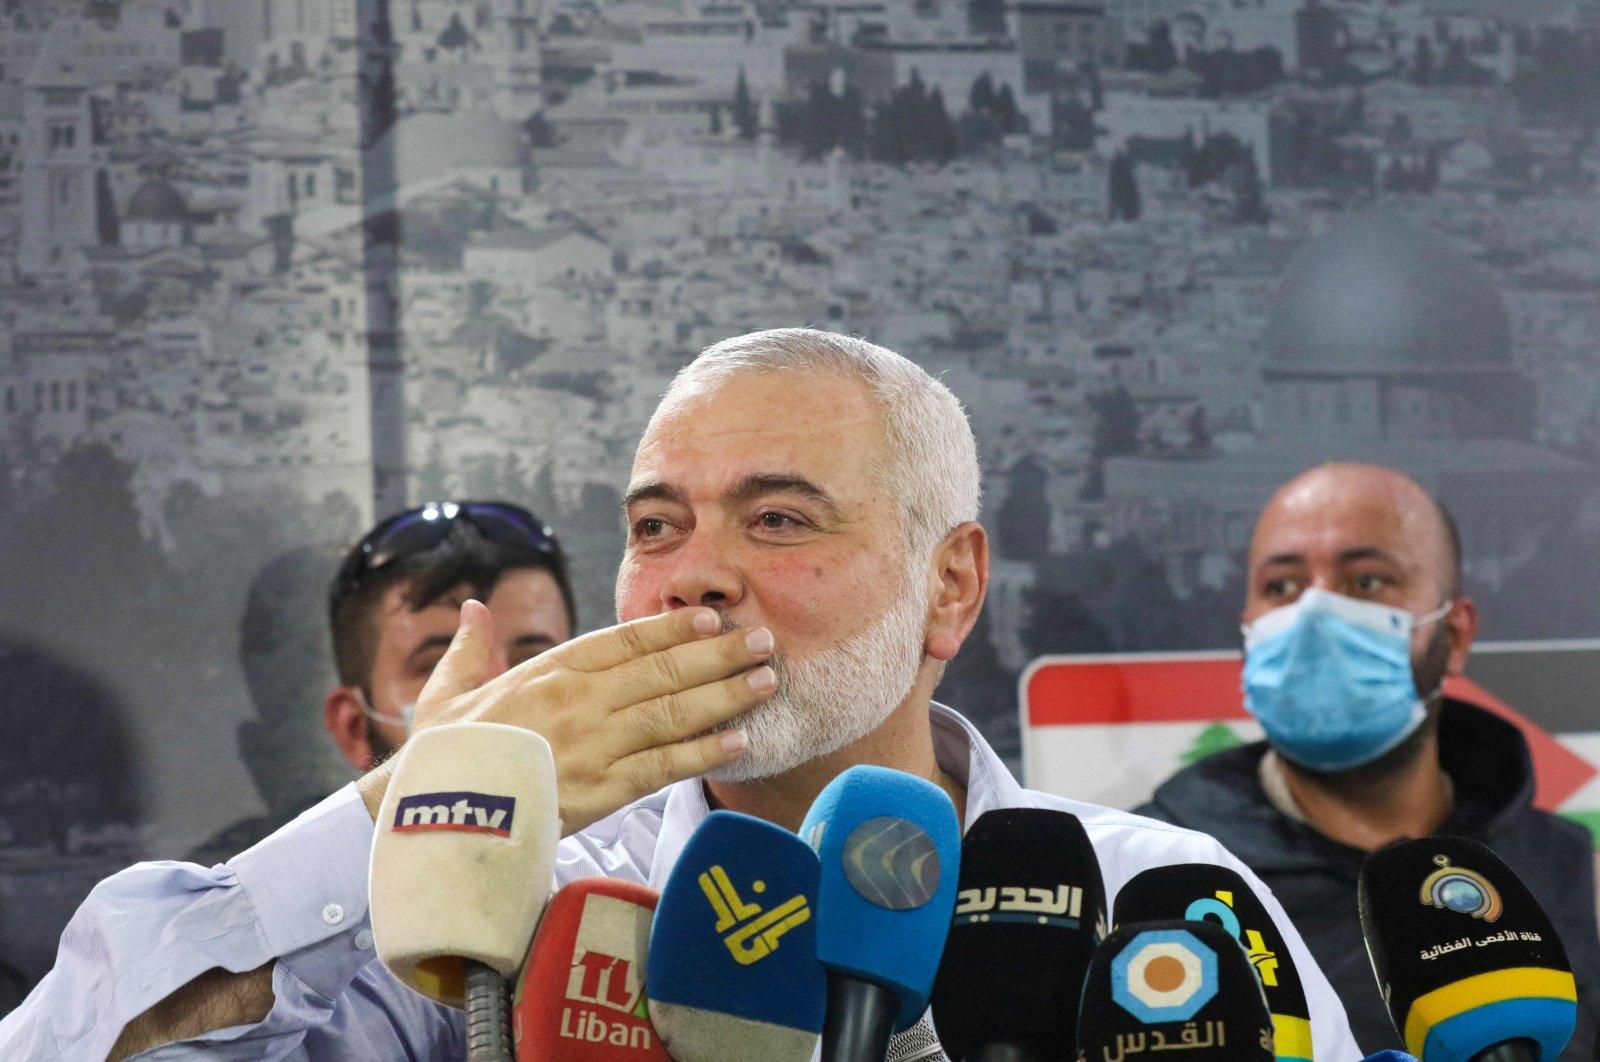 Hamas' political bureau chief Ismail Haniya gestures to supporters, Sidon, Sept. 6, 2020. (AFP Photo)